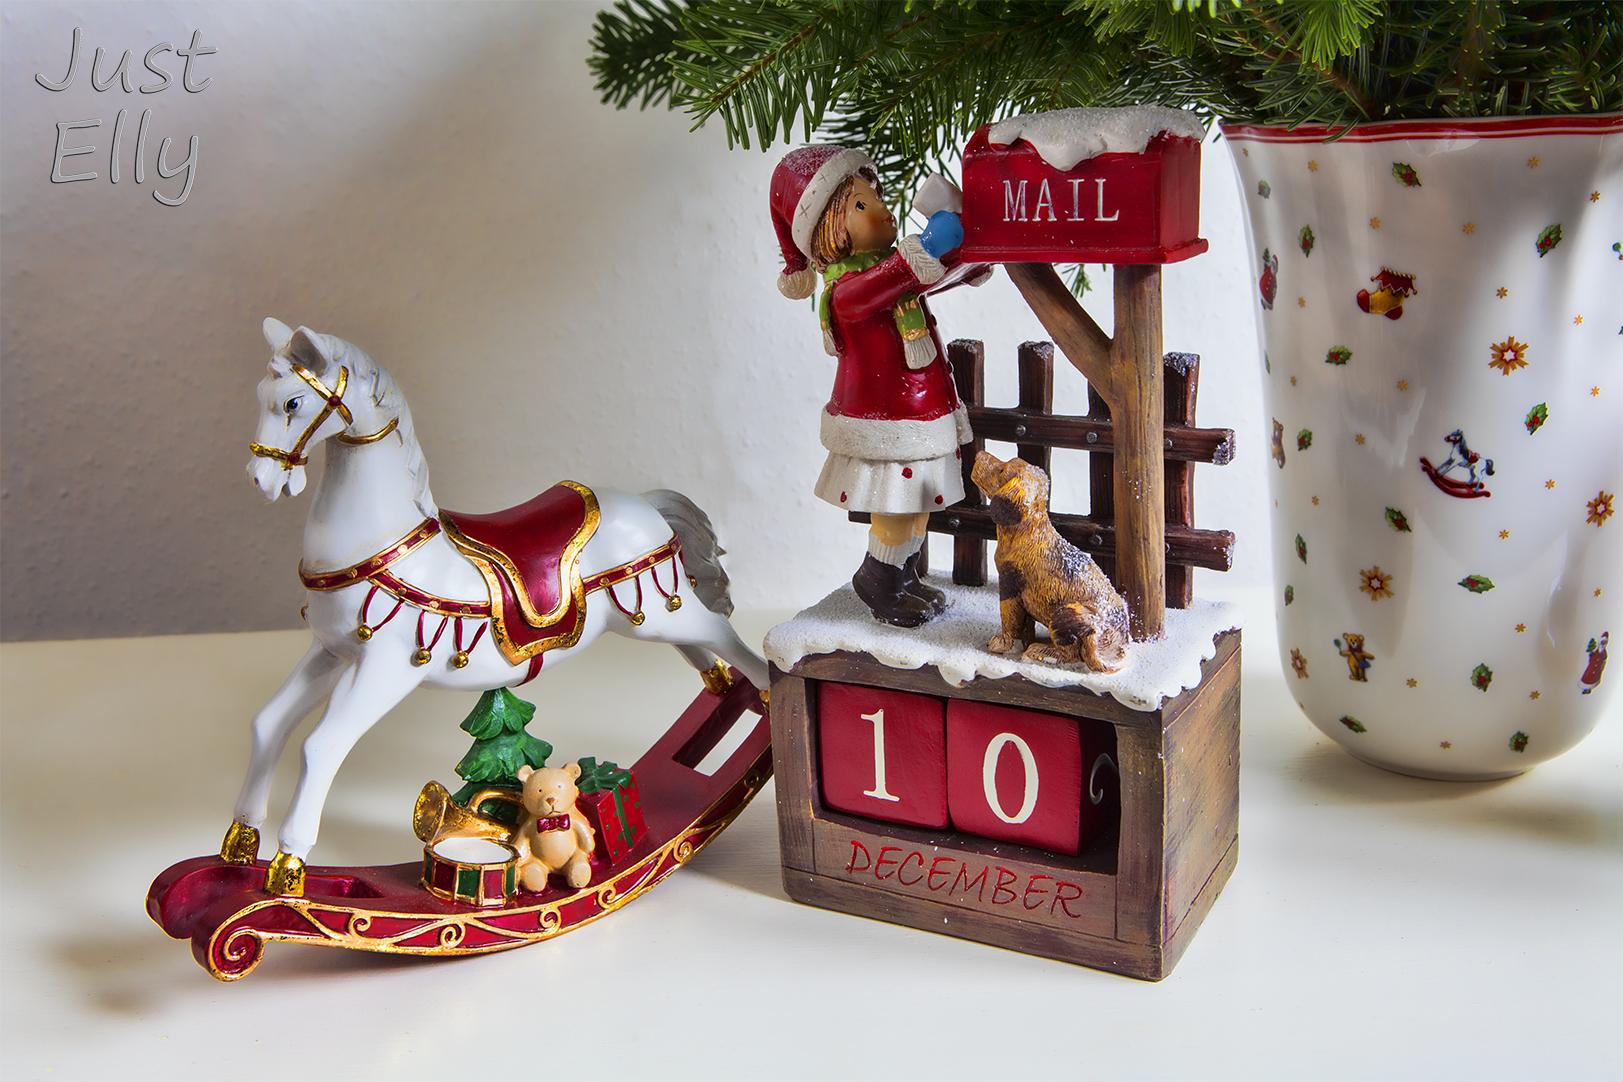 December 10 - My advent calendar